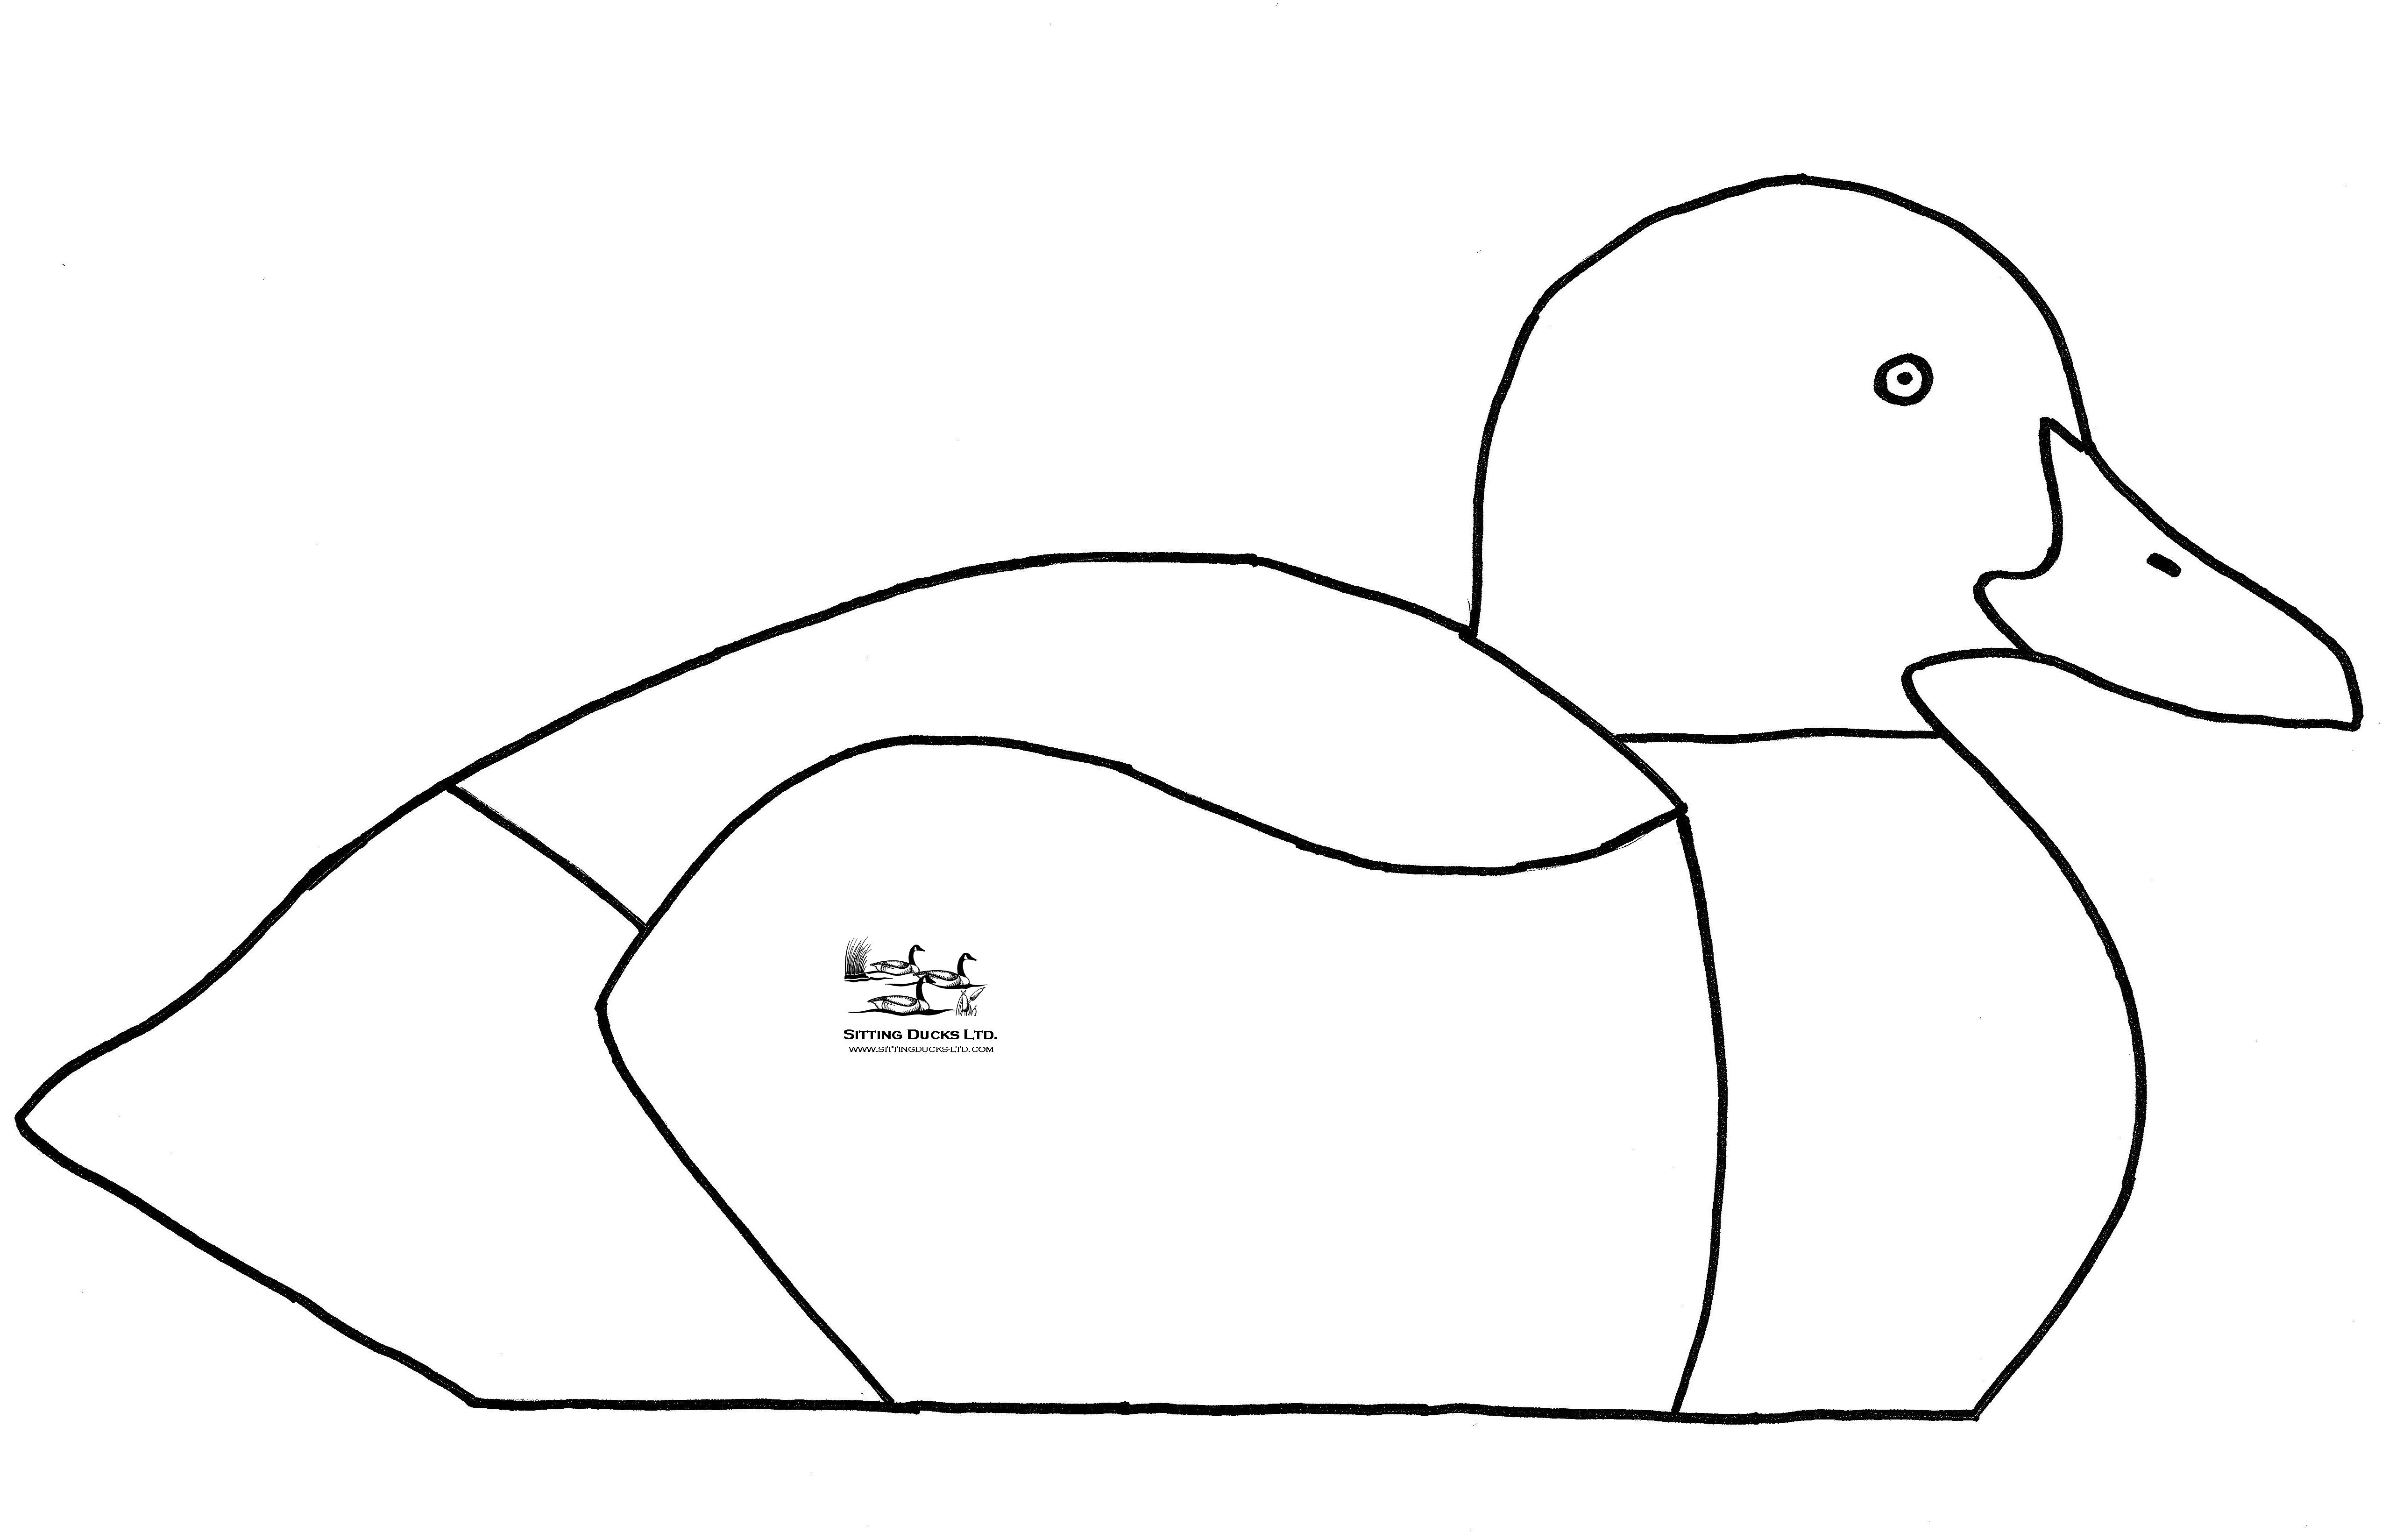 Goose Silhouette Template At Getdrawings